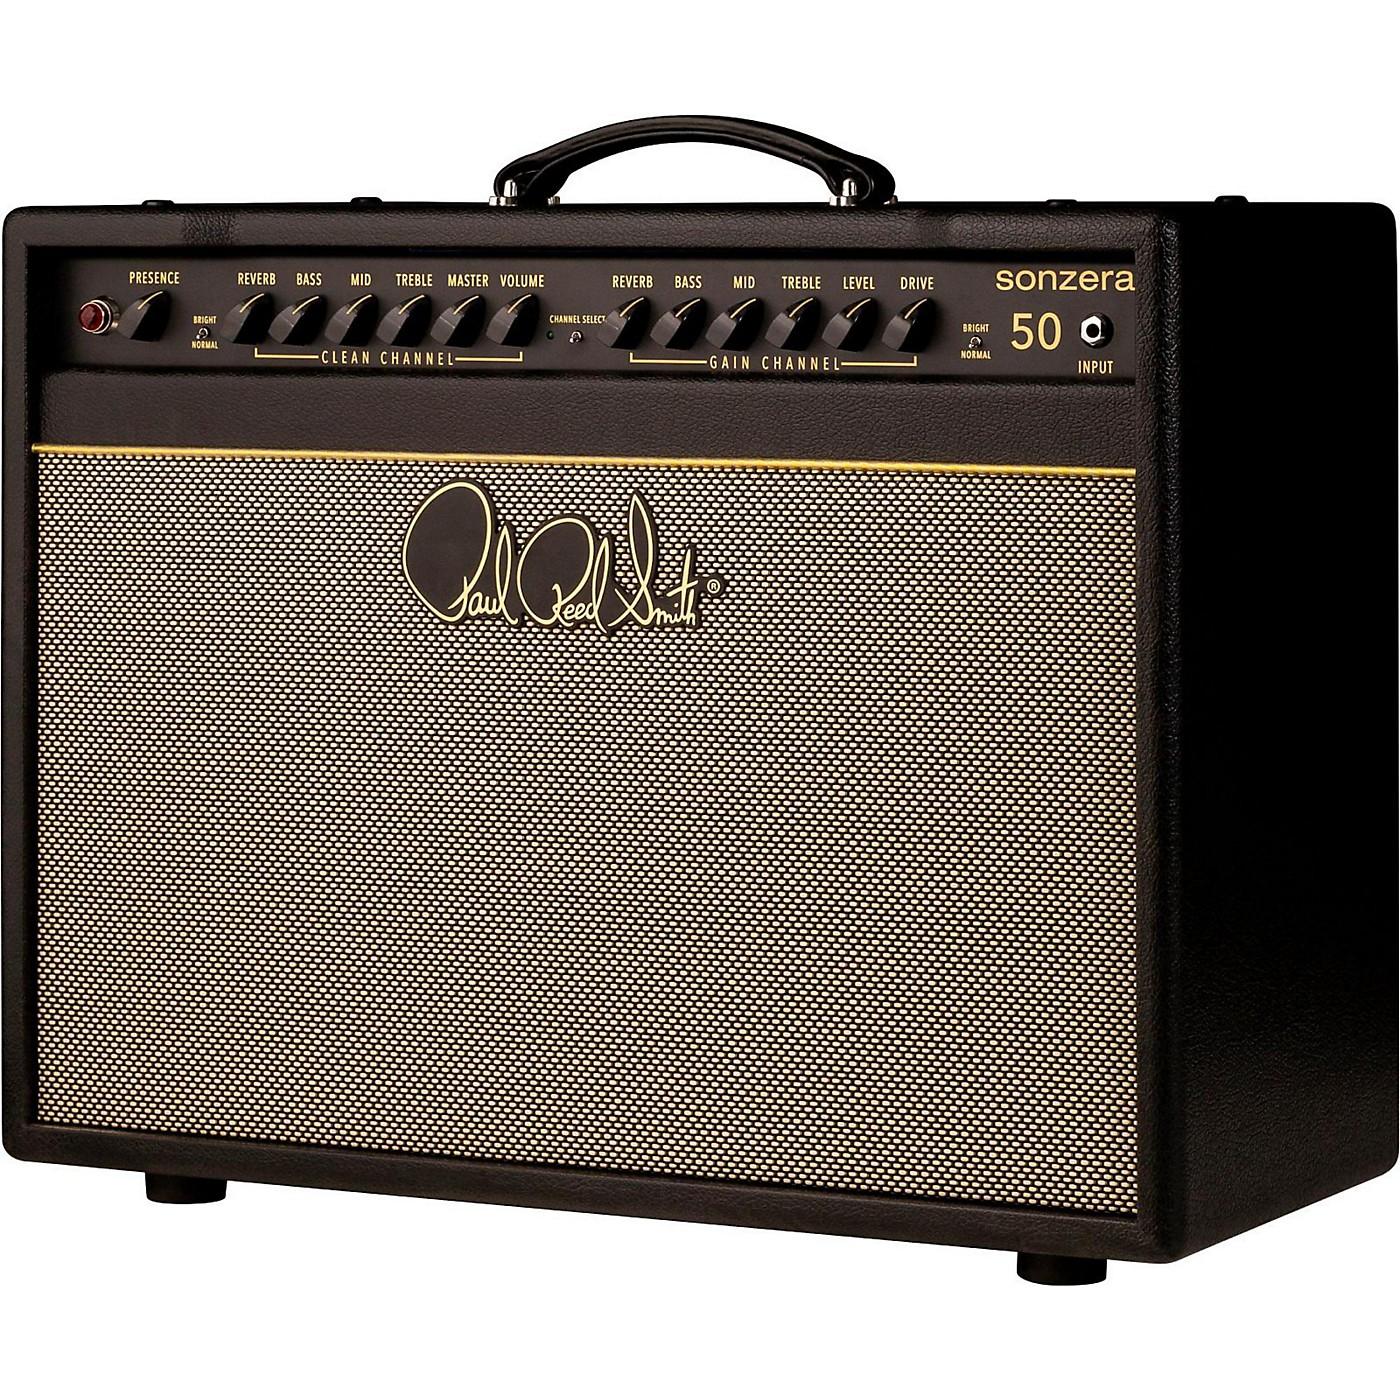 PRS Sonzera 50 50W 1x12 Tube Guitar Combo Amplifier thumbnail